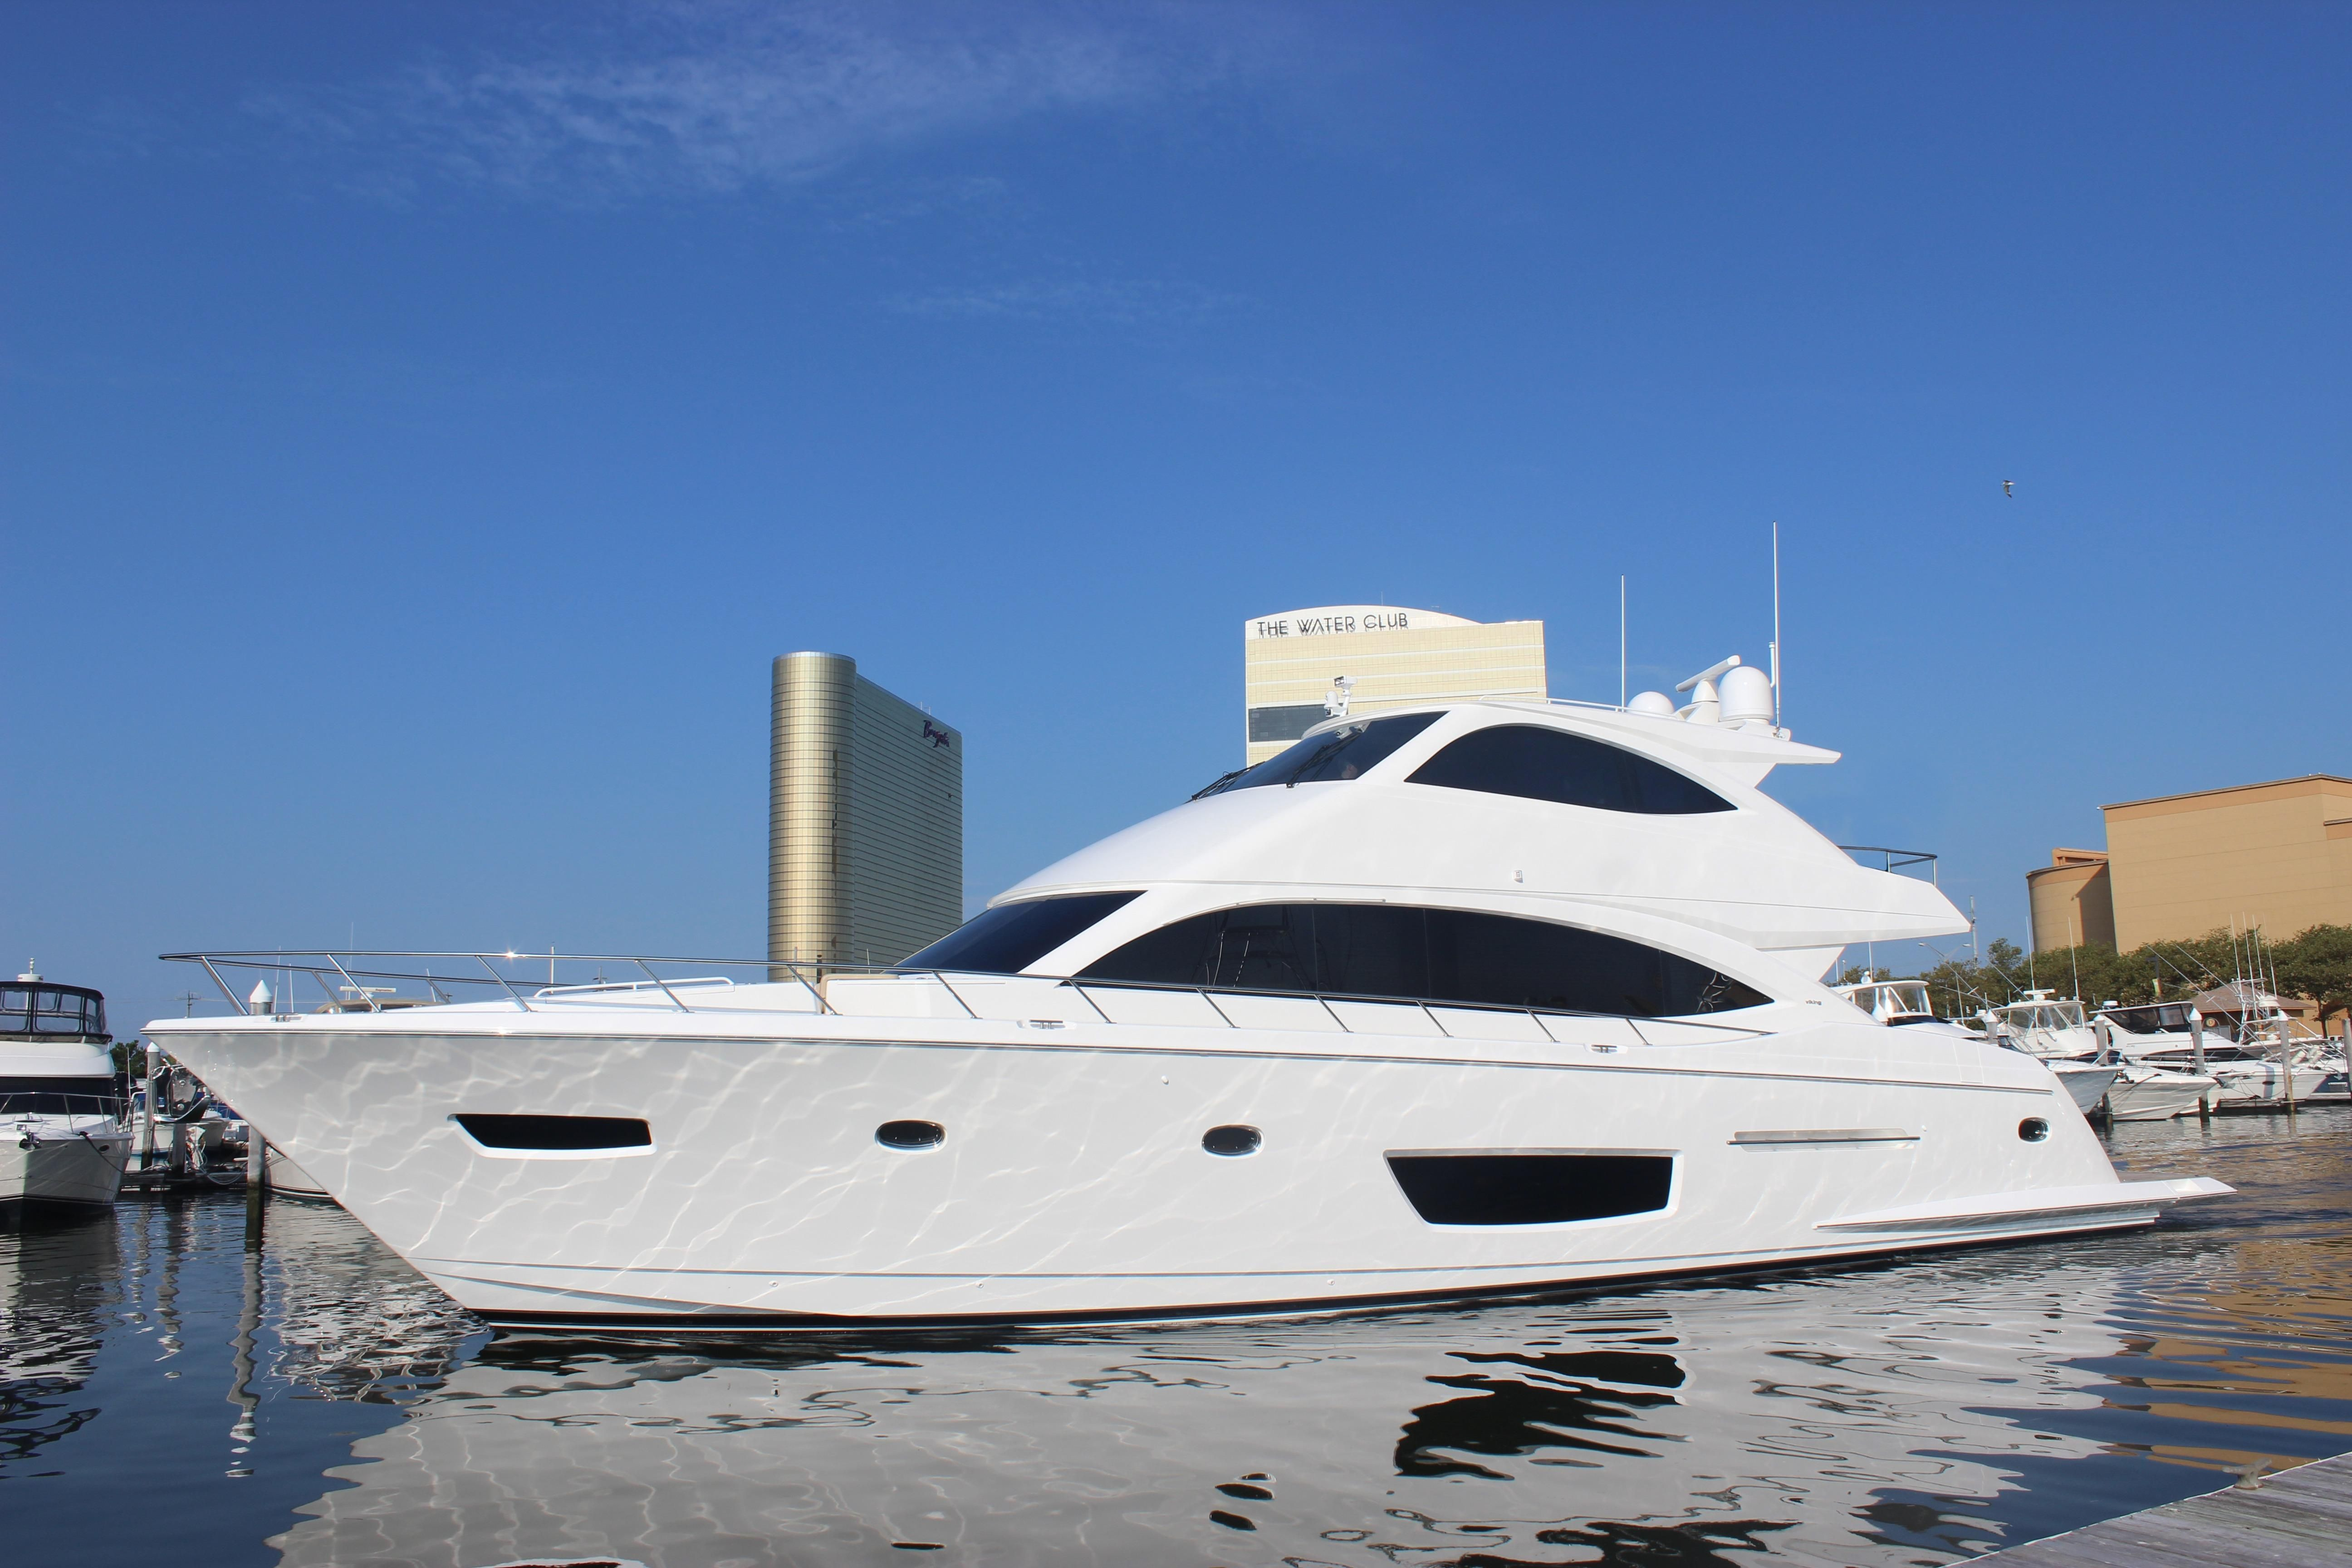 2018 viking 75 motor yacht power boat for sale www for 85 viking motor yacht